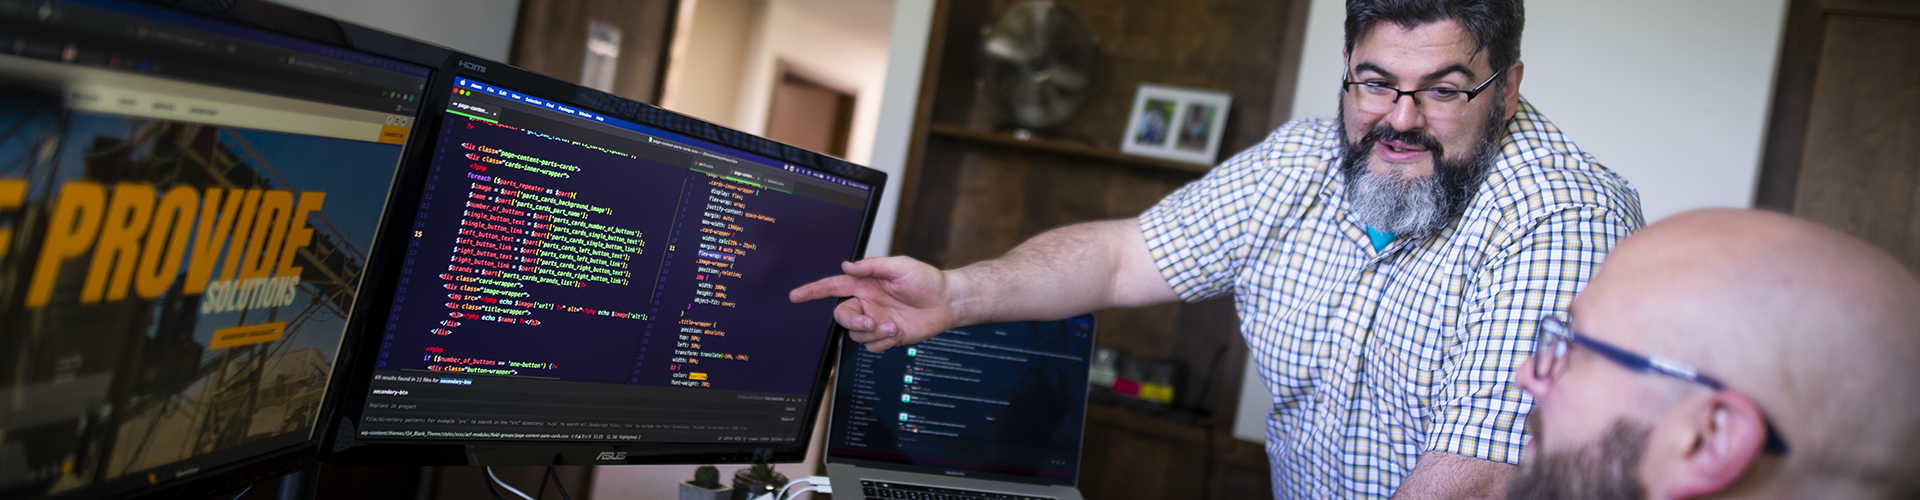 Web Development header image